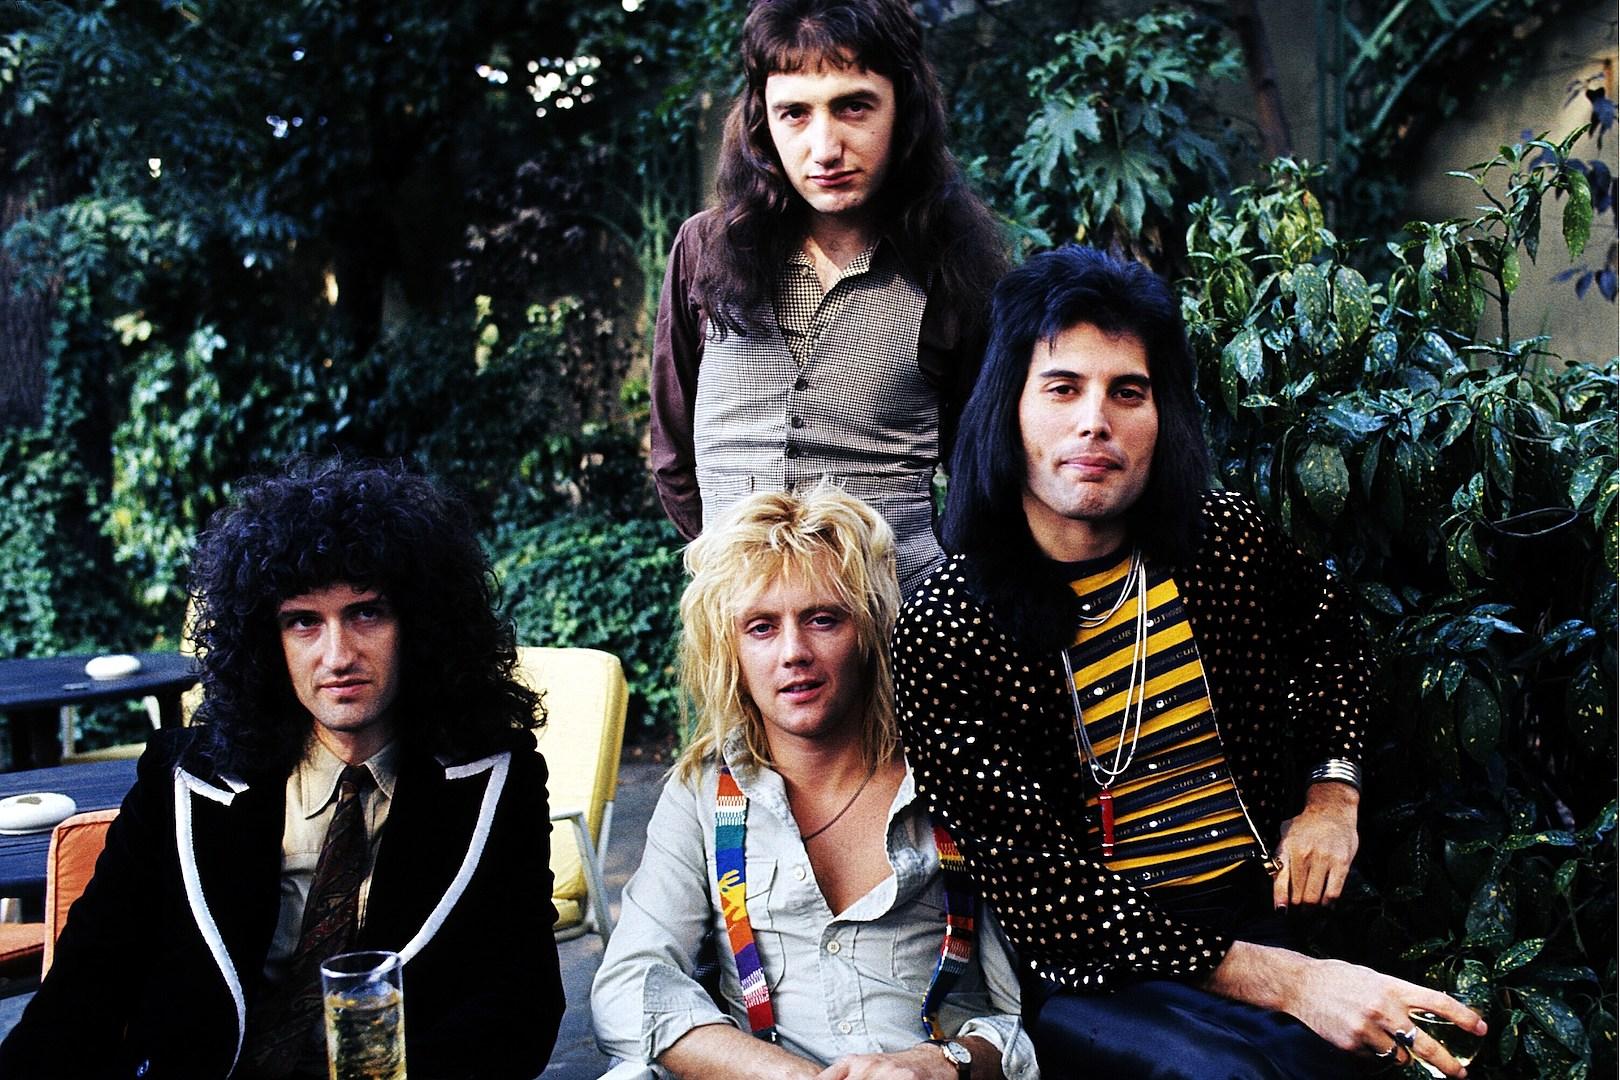 Queen's 'Bohemian Rhapsody' Video Surpasses One Billion YouTube Views